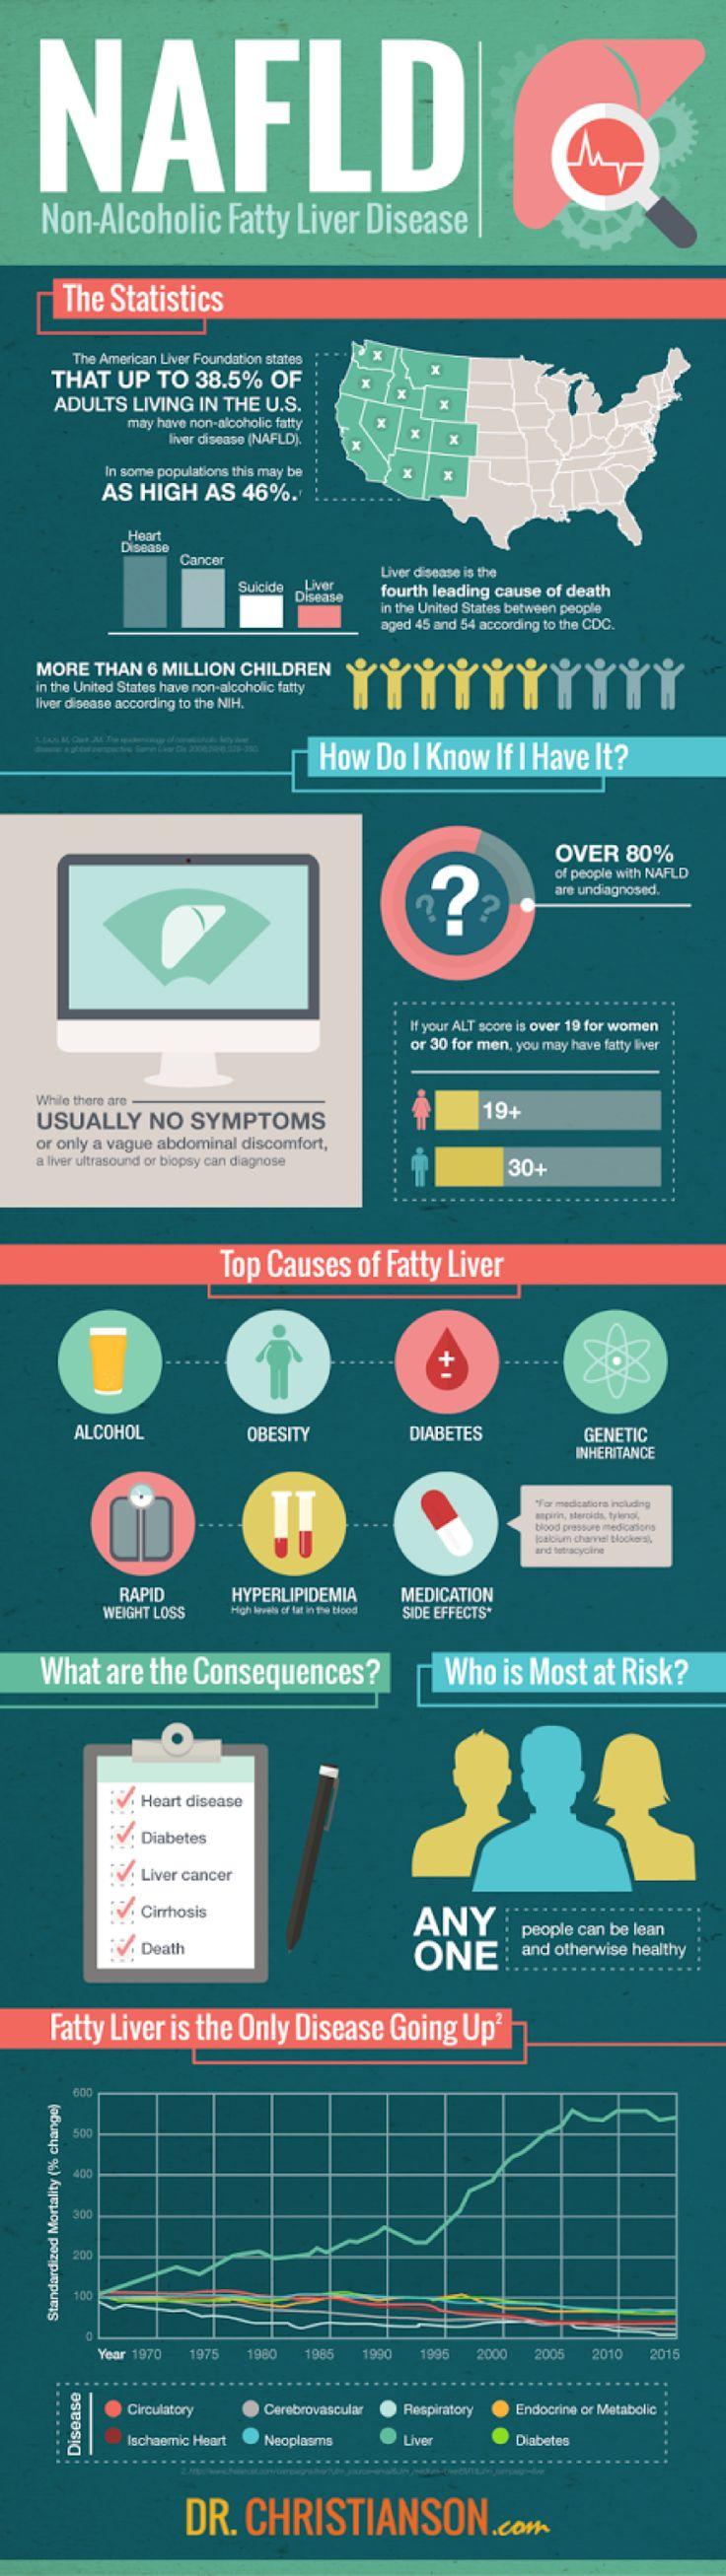 NAFLD Non-Alcoholic Fatty Liver Disease